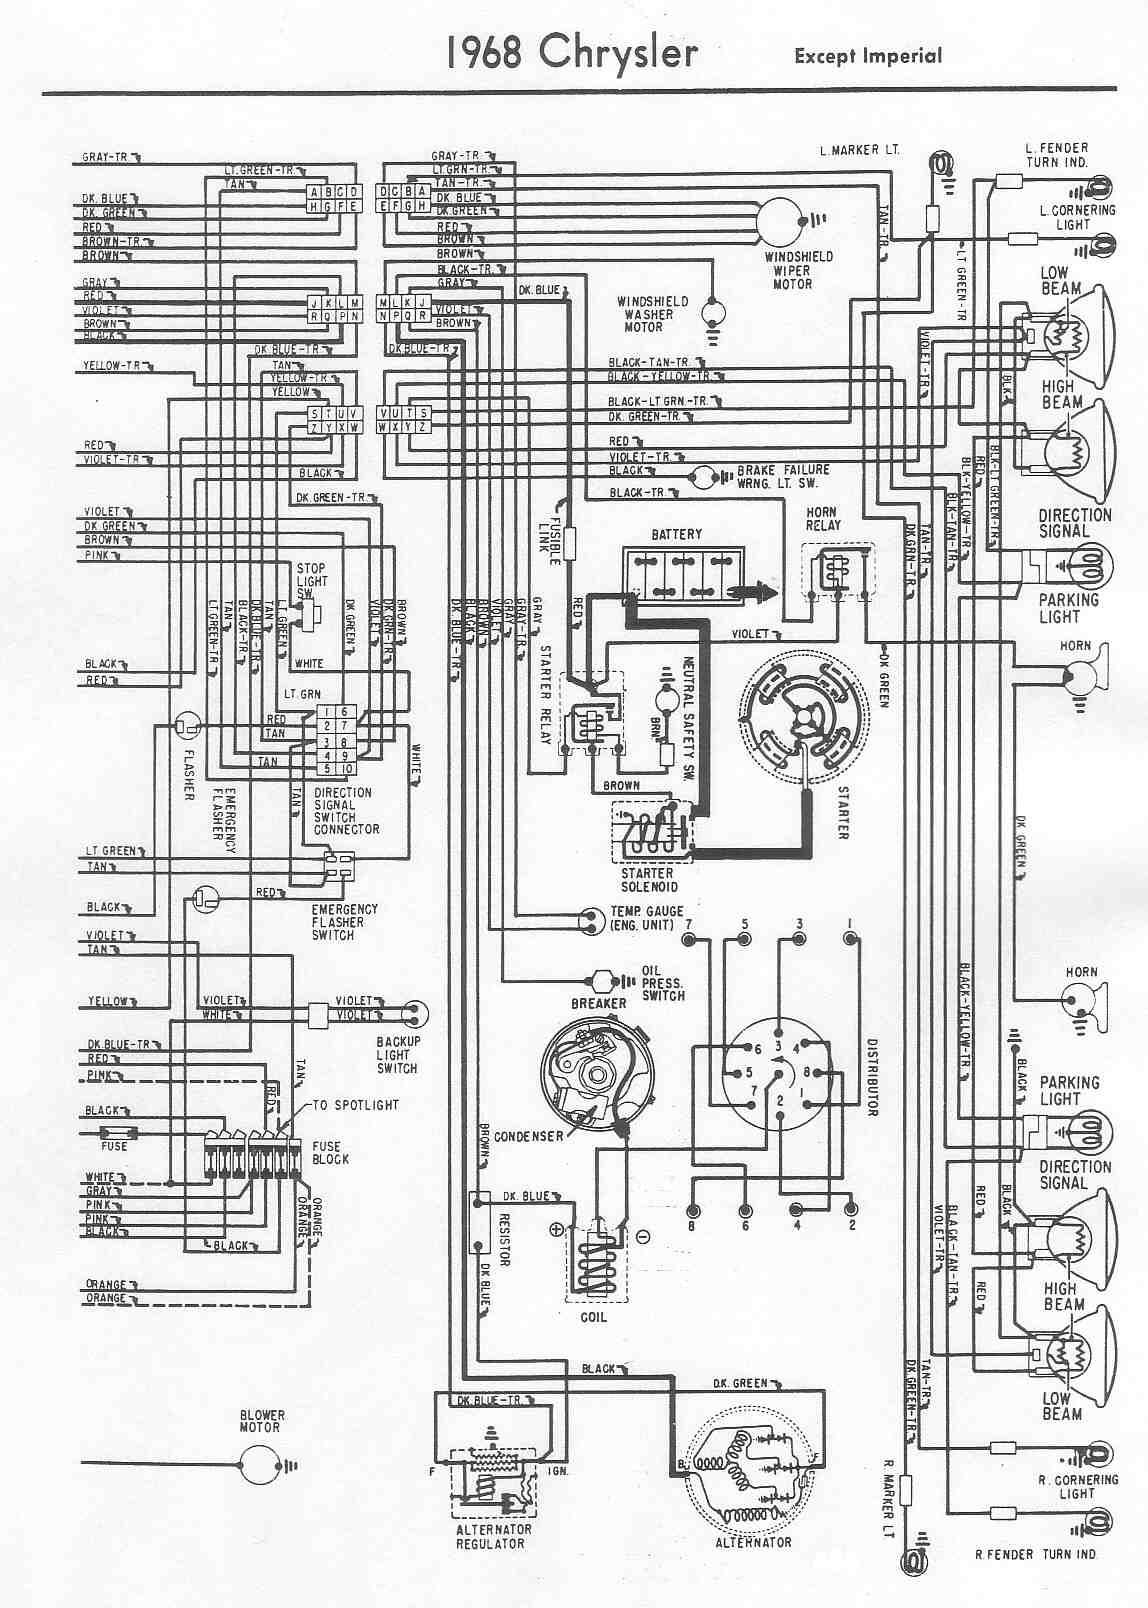 medium resolution of 429 cadillac engine diagram free download wiring diagram schematic1968 cadillac engine diagram 6 stromoeko de u2022